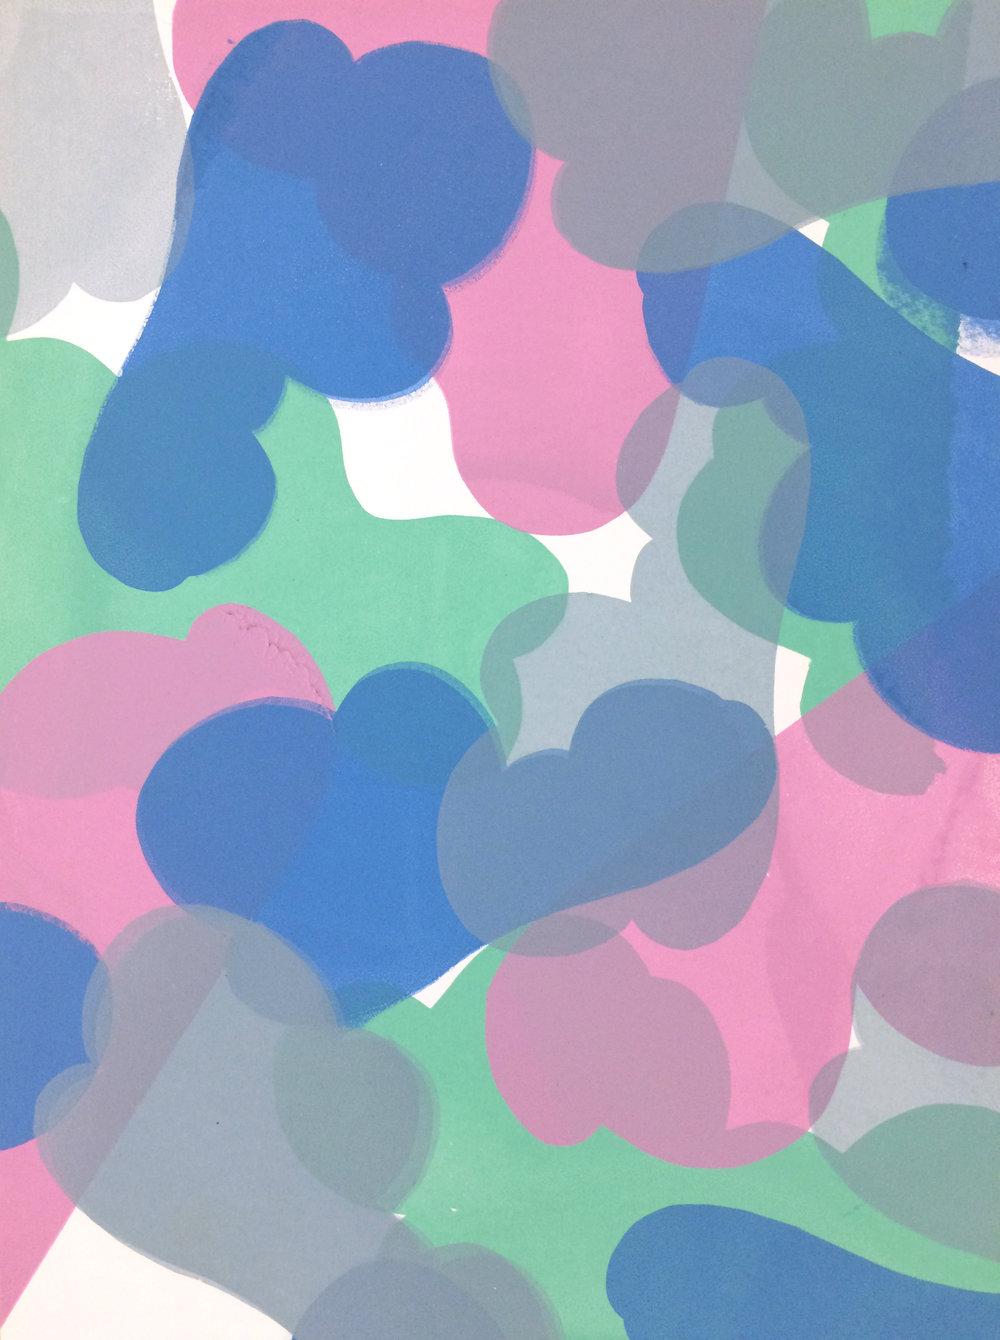 Cloud Remix 009